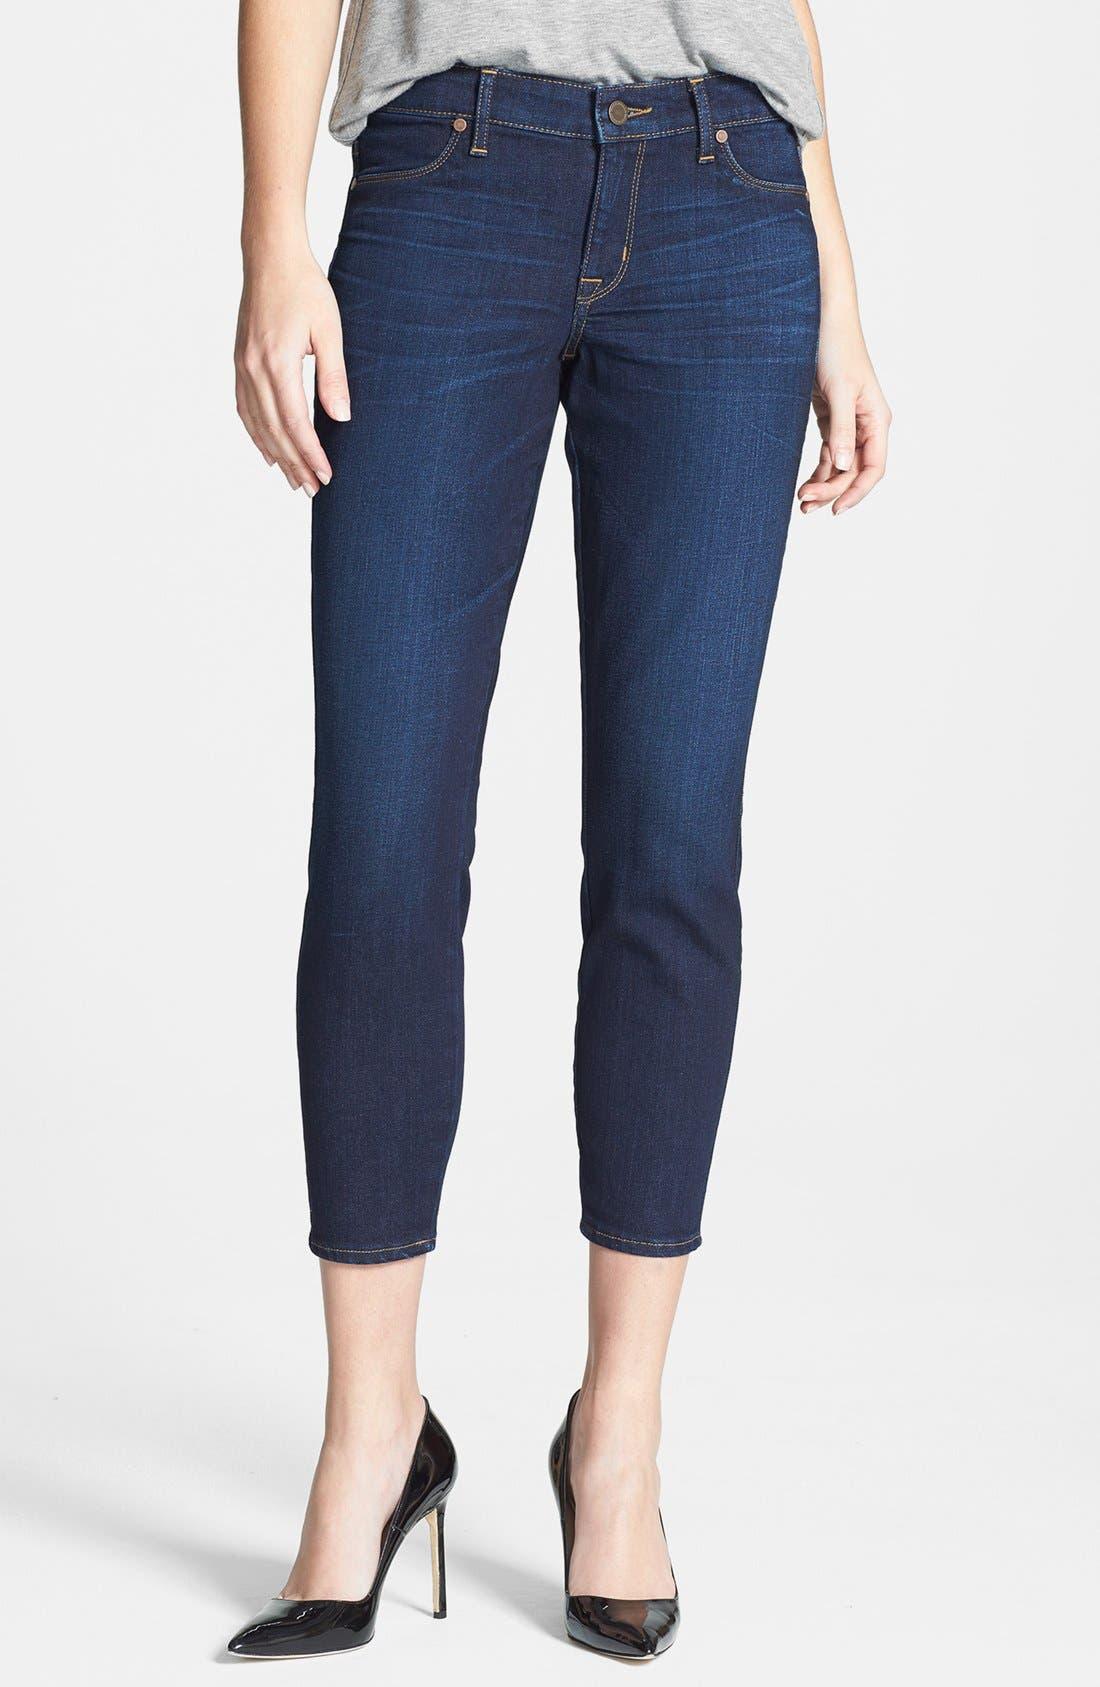 Alternate Image 1 Selected - CJ by Cookie Johnson 'Believe' Crop Stretch Denim Skinny Jeans (Jeames)